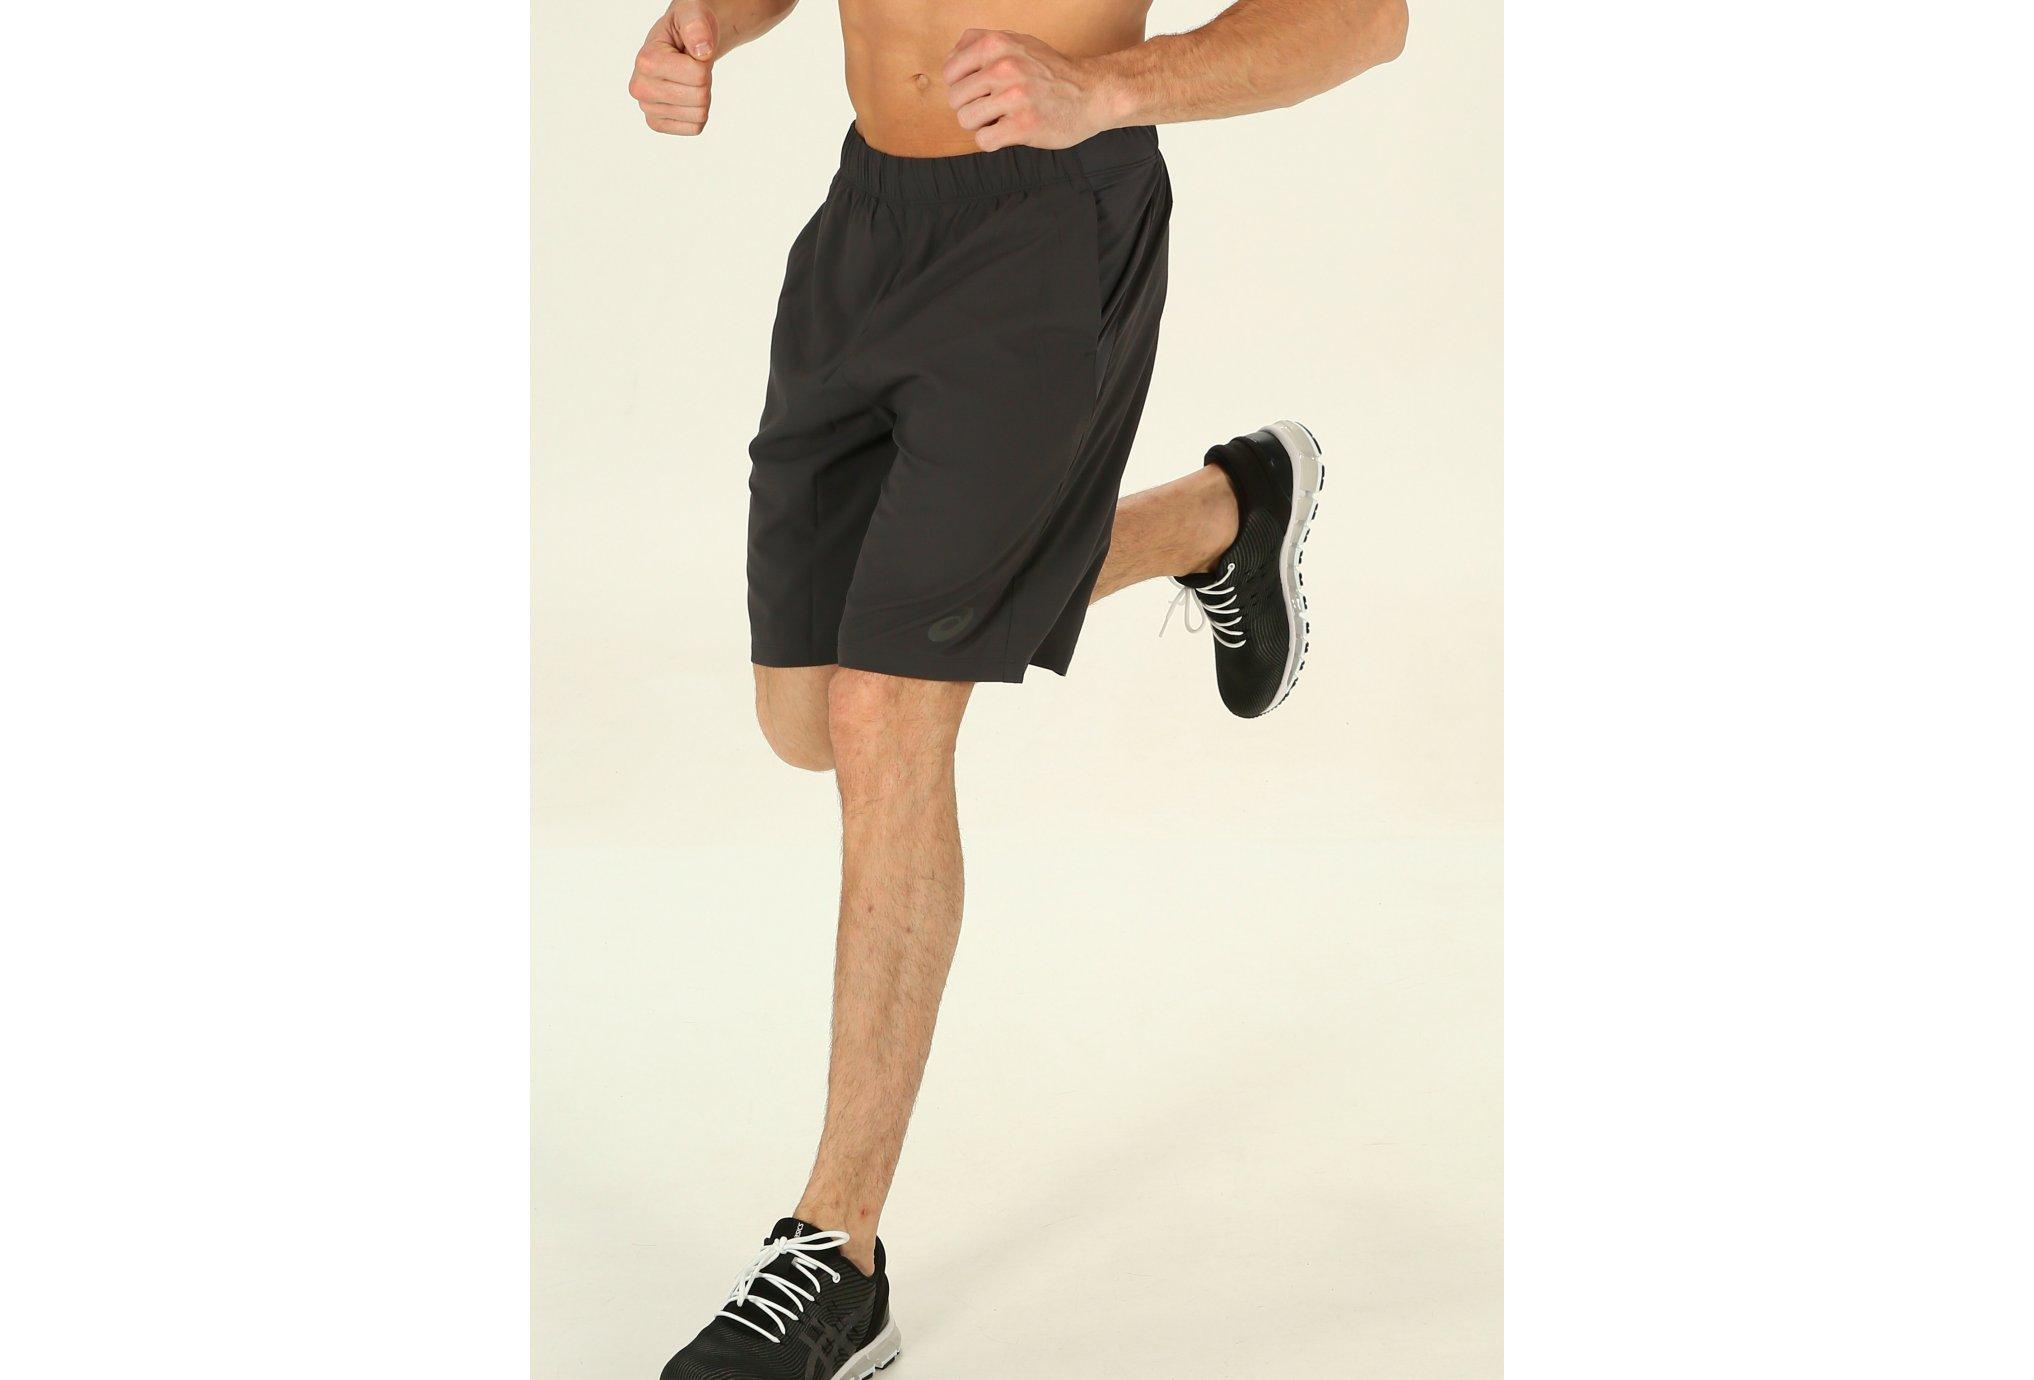 Asics Short FuzeX M vêtement running homme